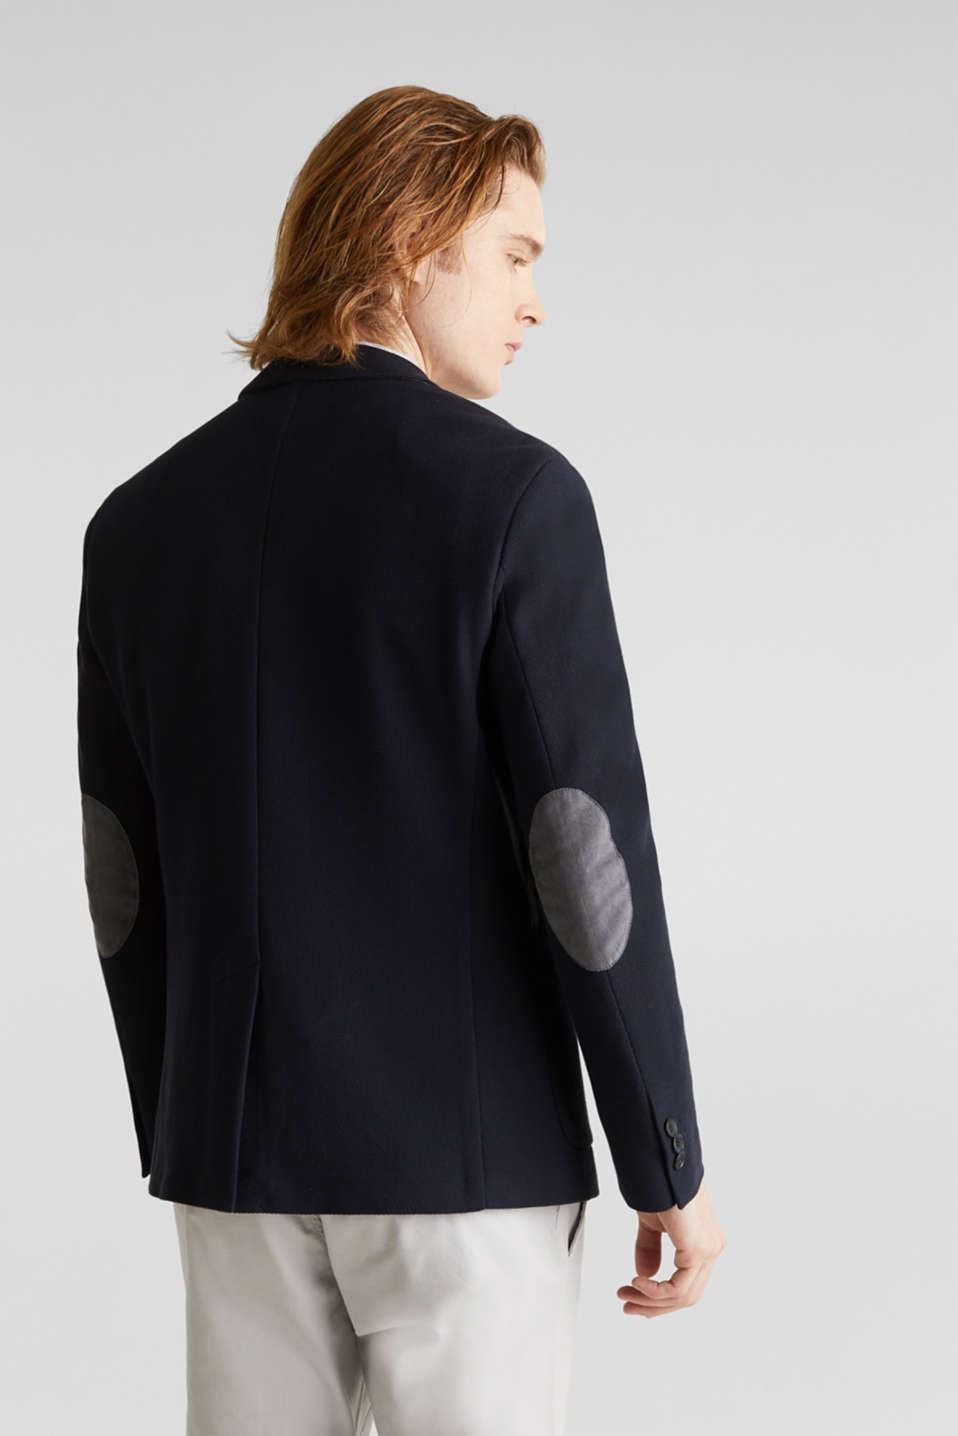 sports jacket made of 100% cotton, DARK BLUE, detail image number 3